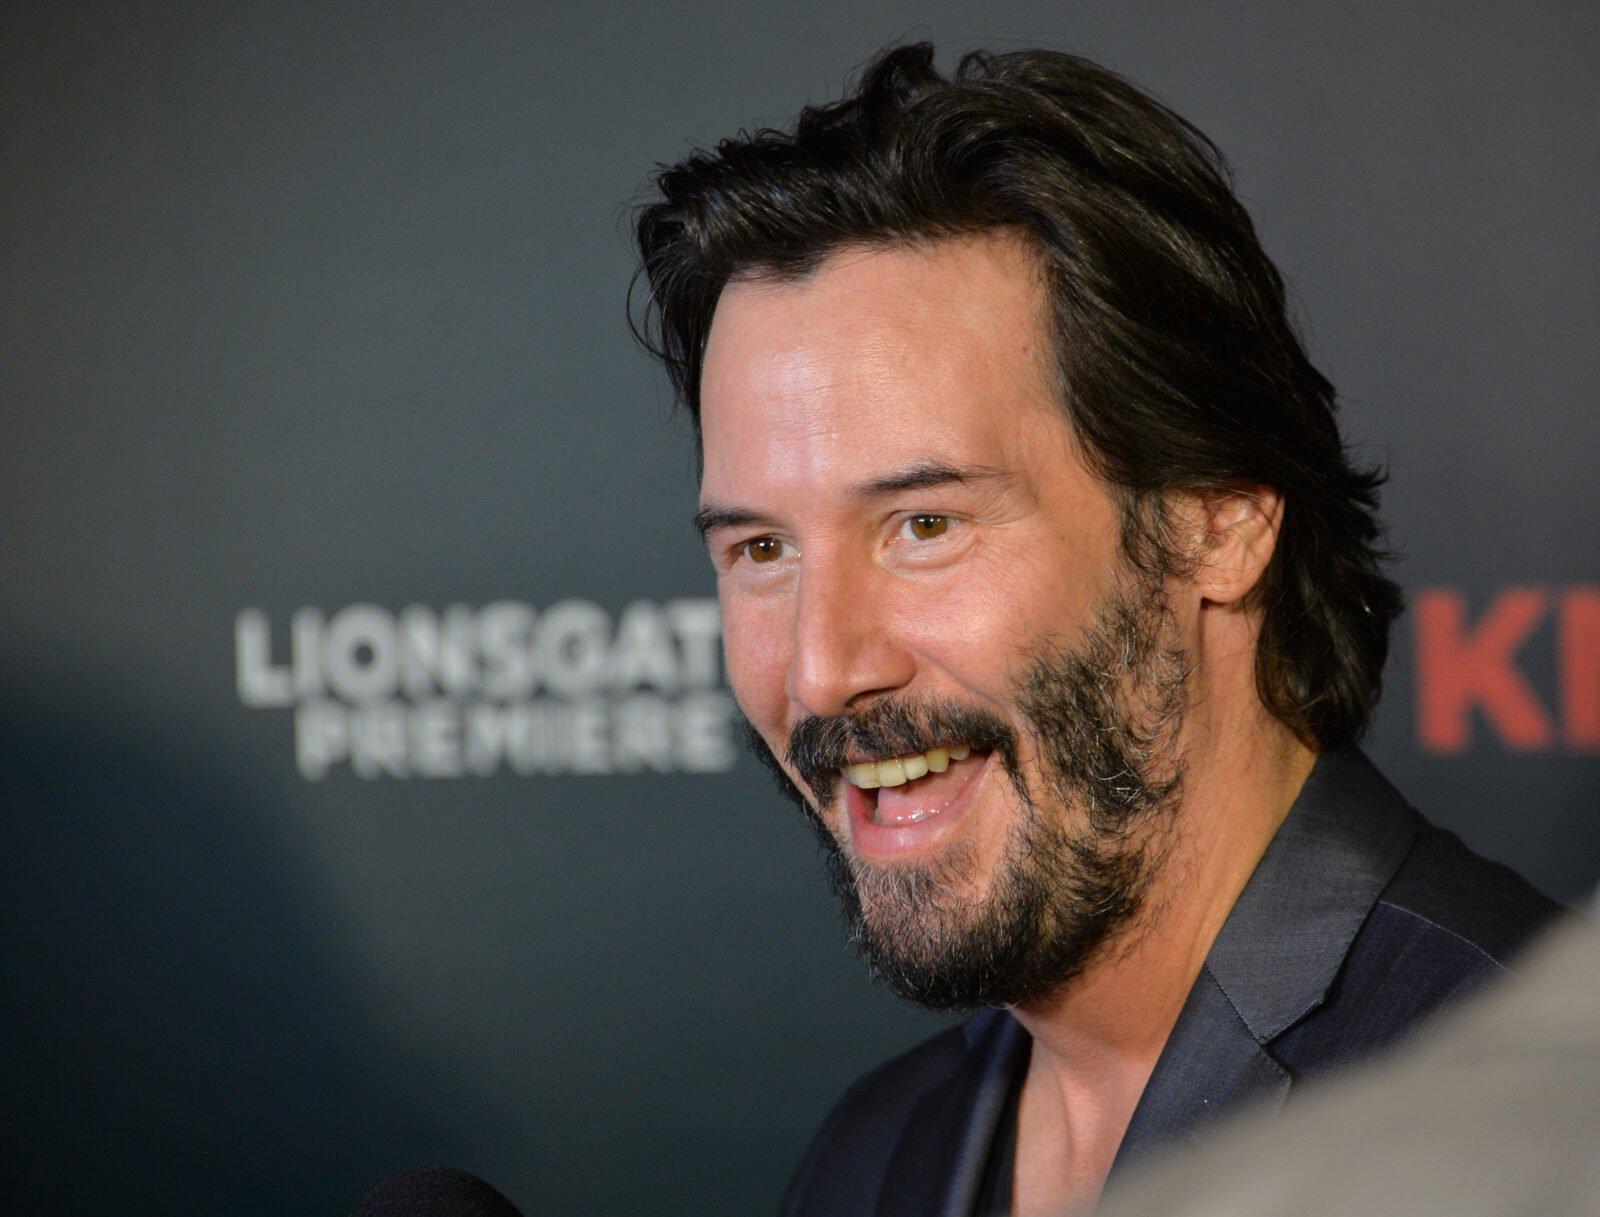 Keanu Reeves Ethnicity